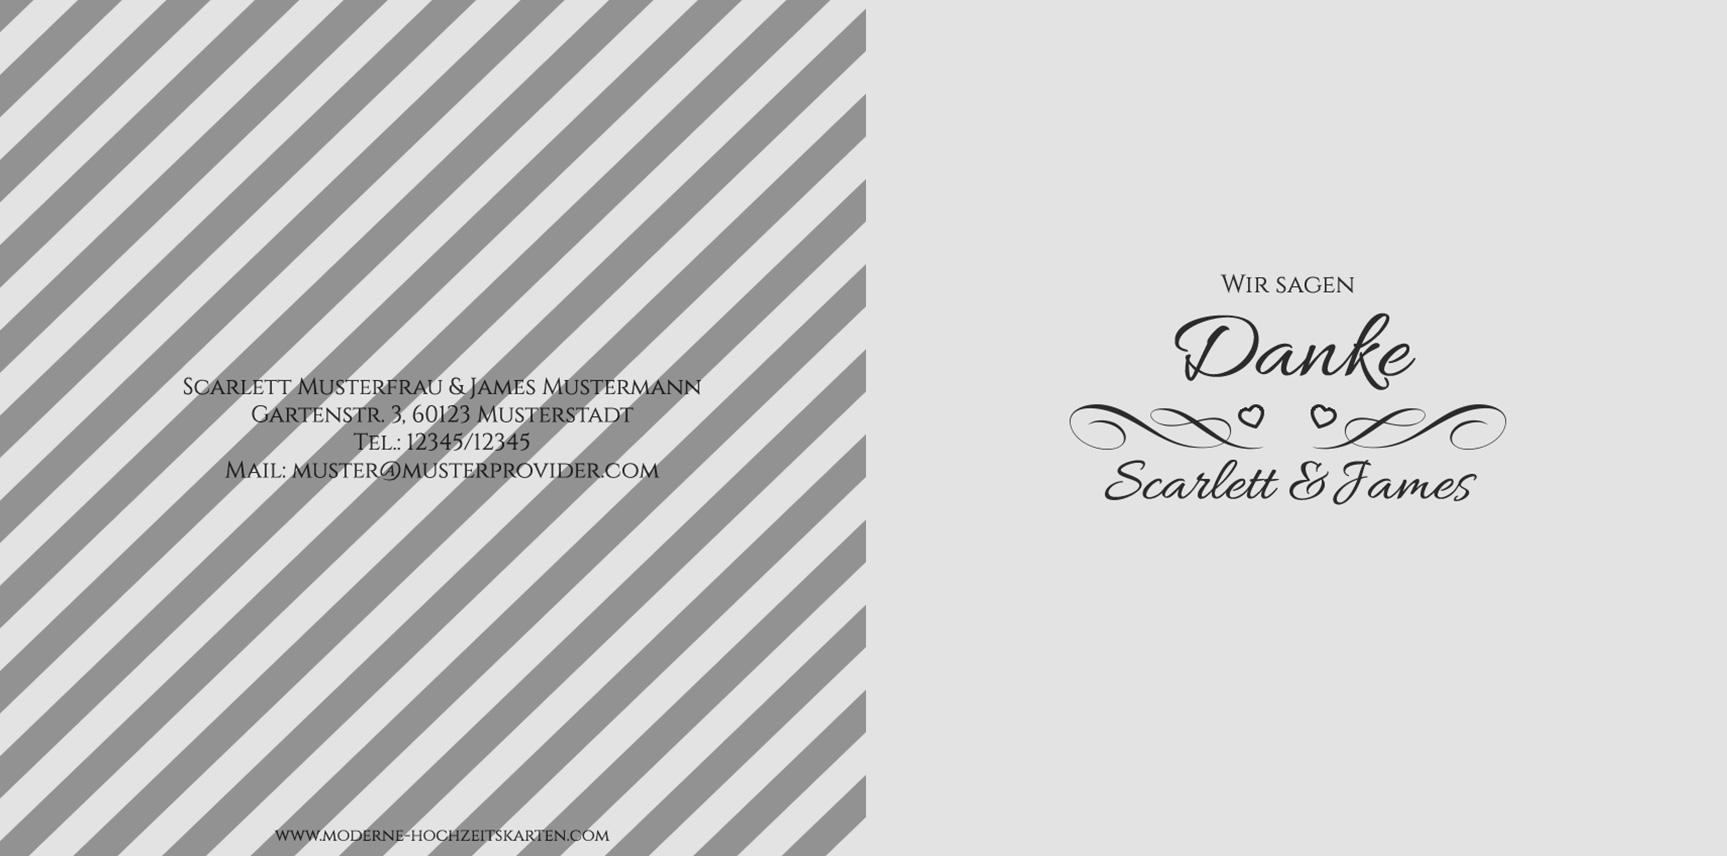 DKQ_editor-arFdLu9K4Fkkm6n